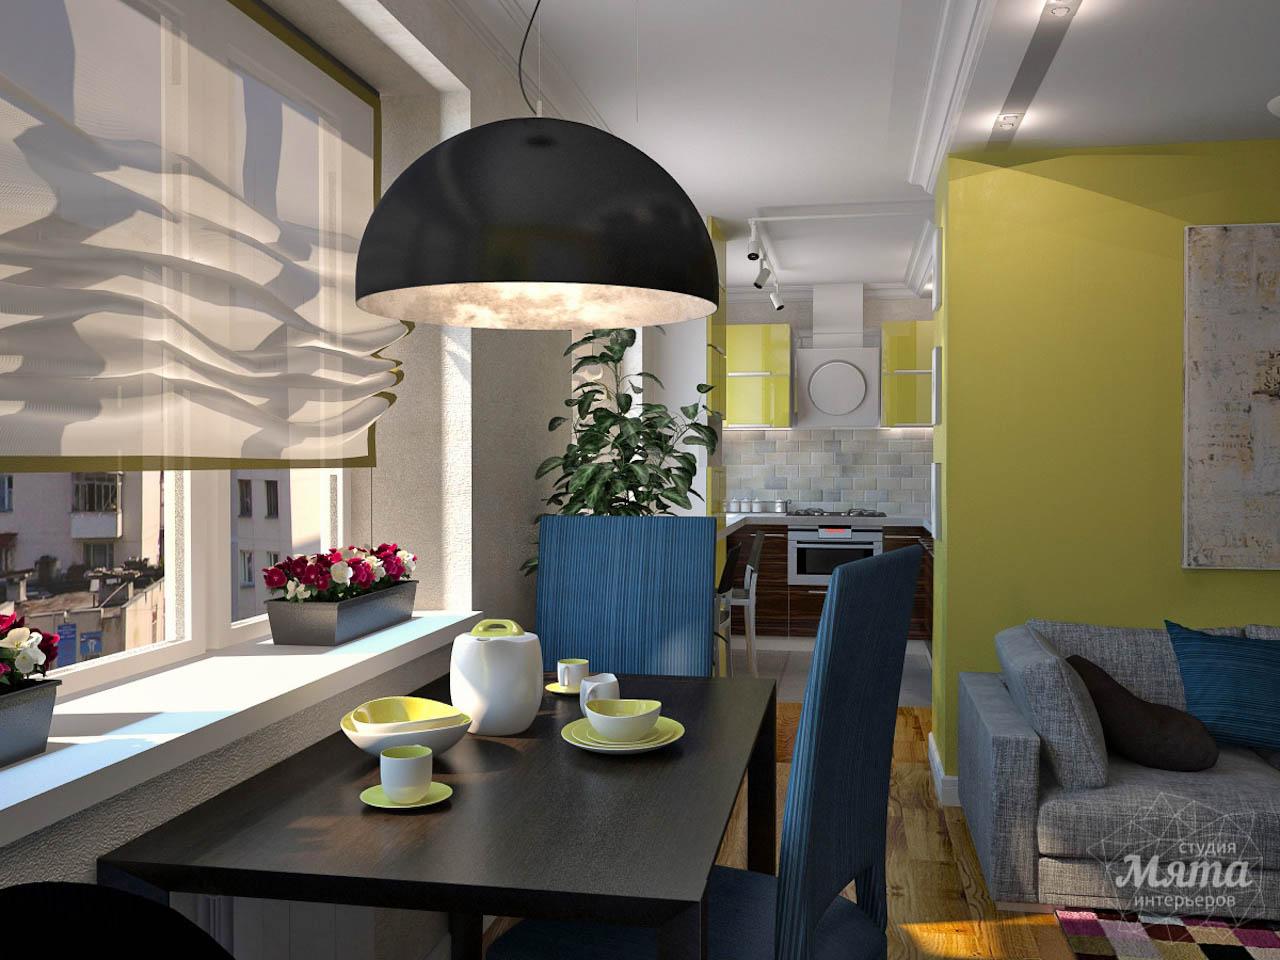 Дизайн интерьера двухкомнатной квартиры по ул. Комсомольская 14 img141091685